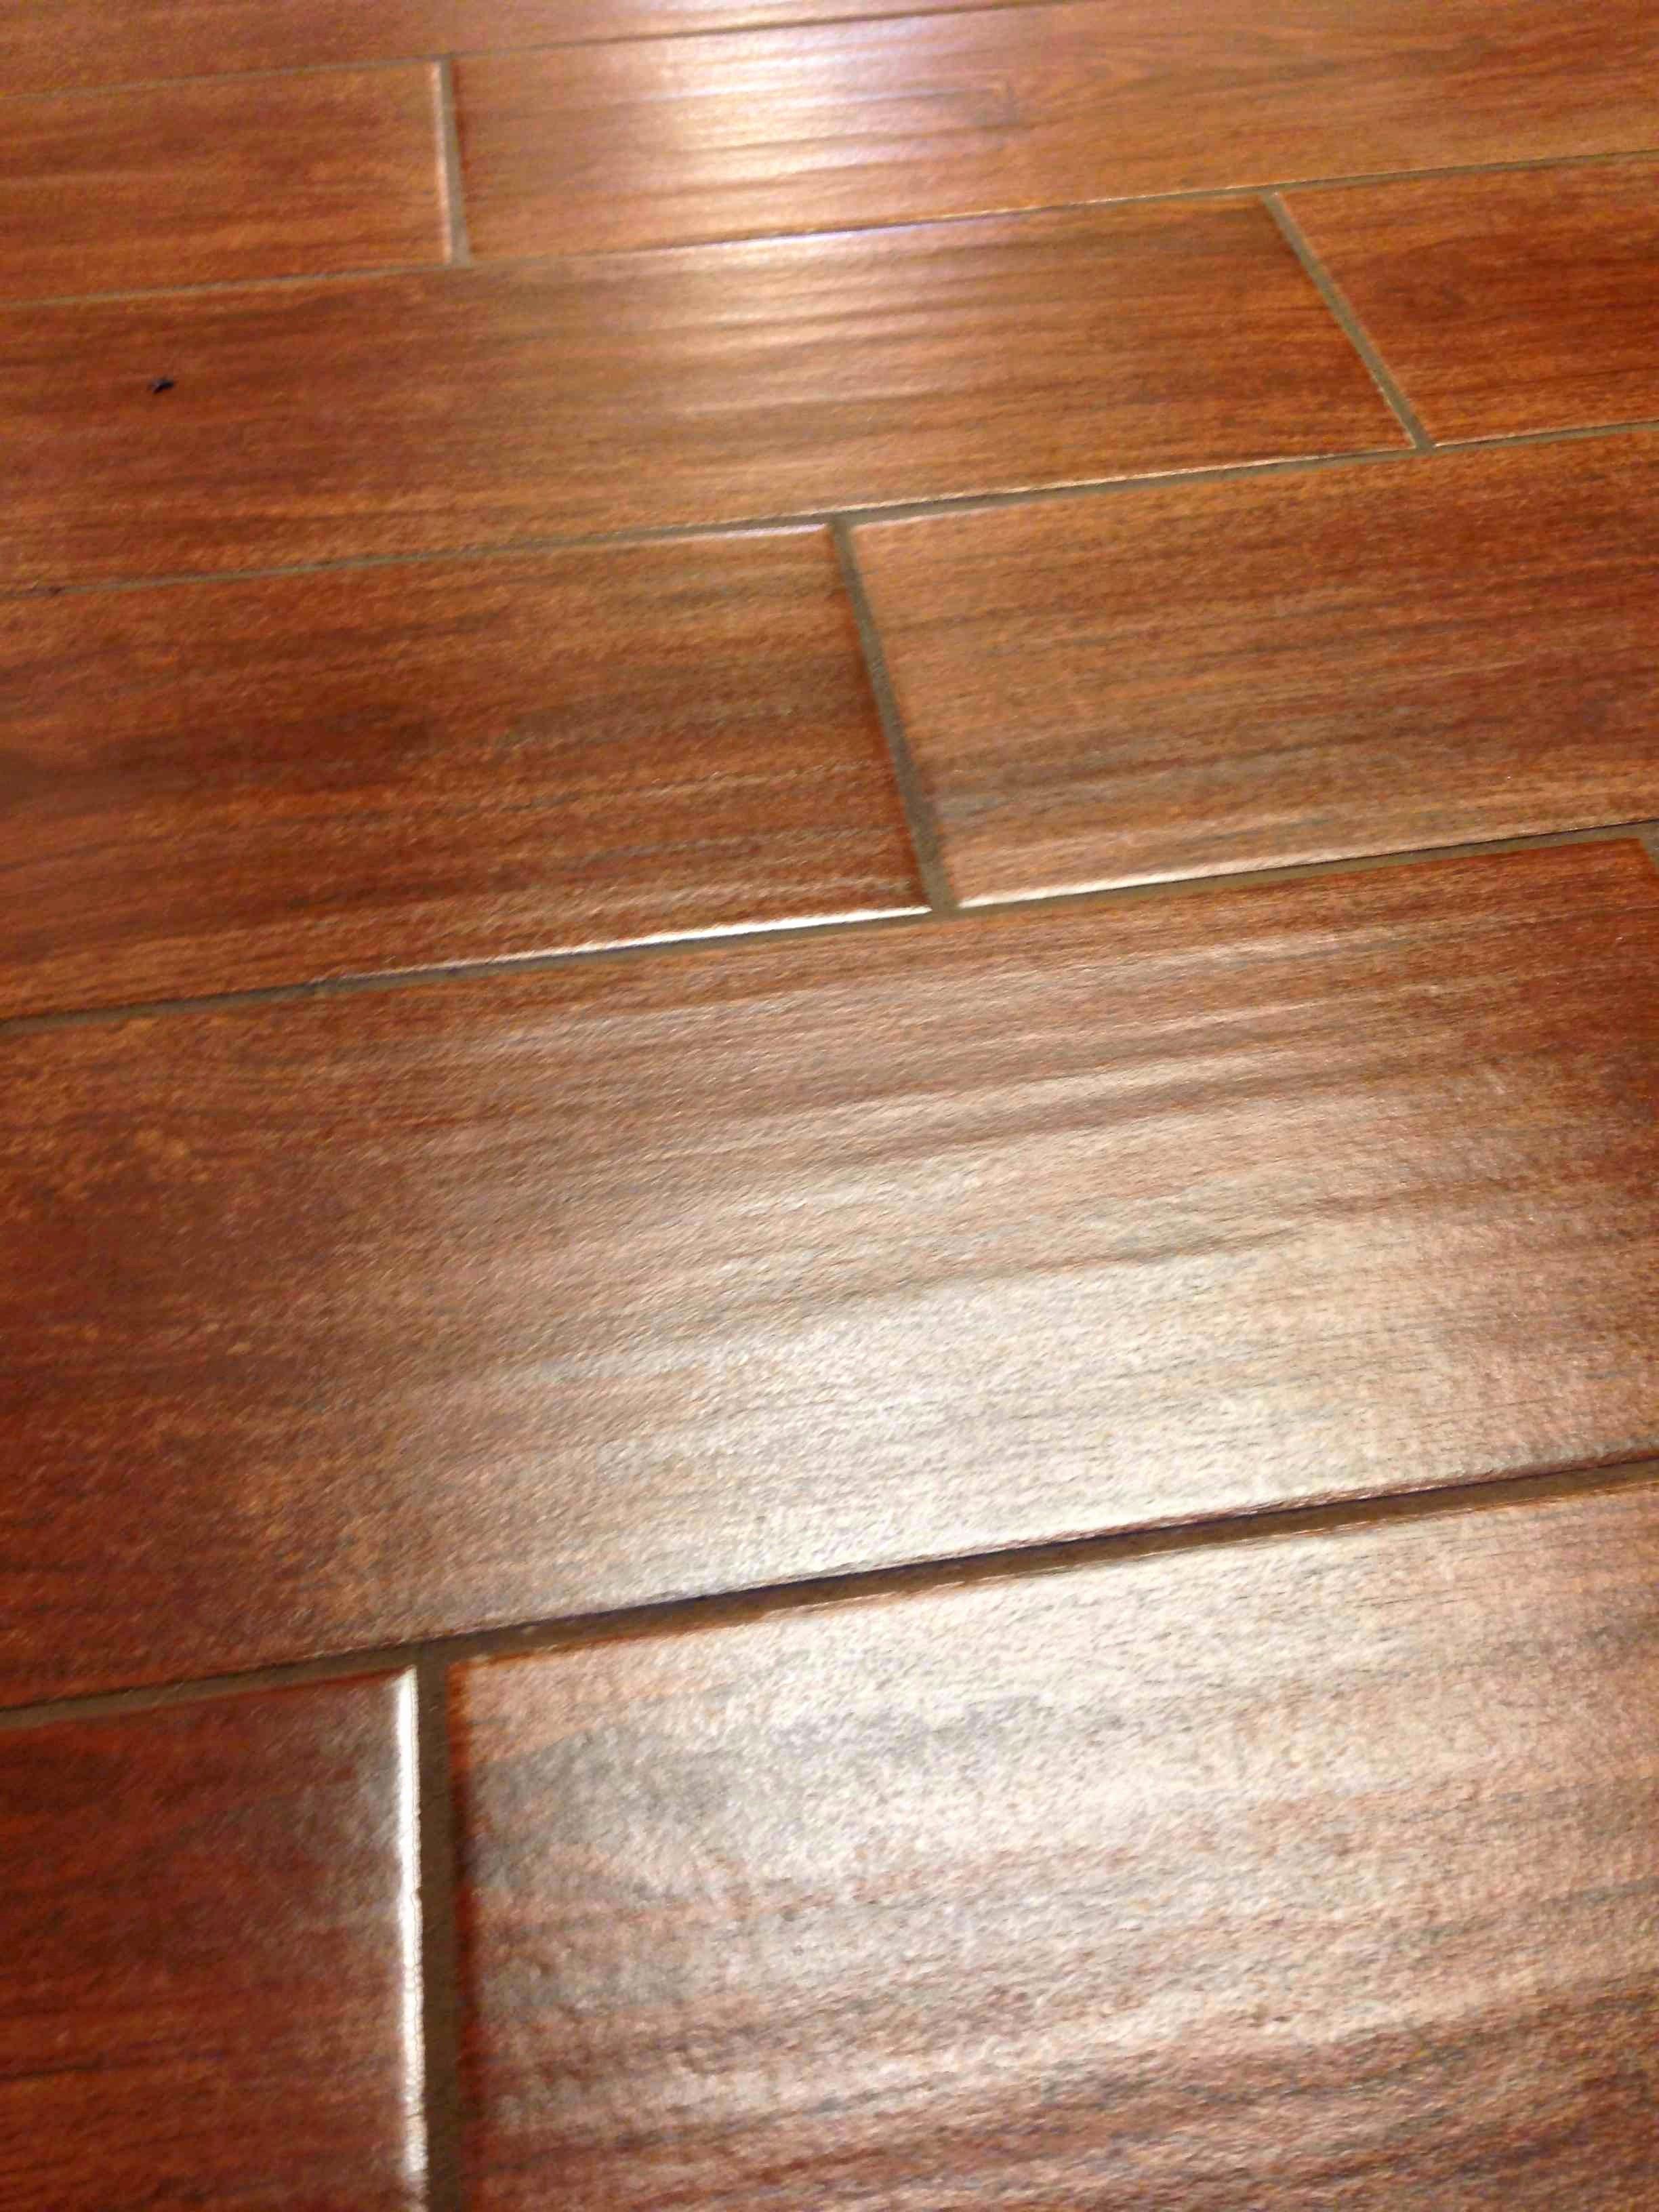 best hardwood floor shiner of 16 fresh hardwood floor polish photos dizpos com within hardwood floor polish new 50 beautiful redoing hardwood floors 50 s pics of 16 fresh hardwood